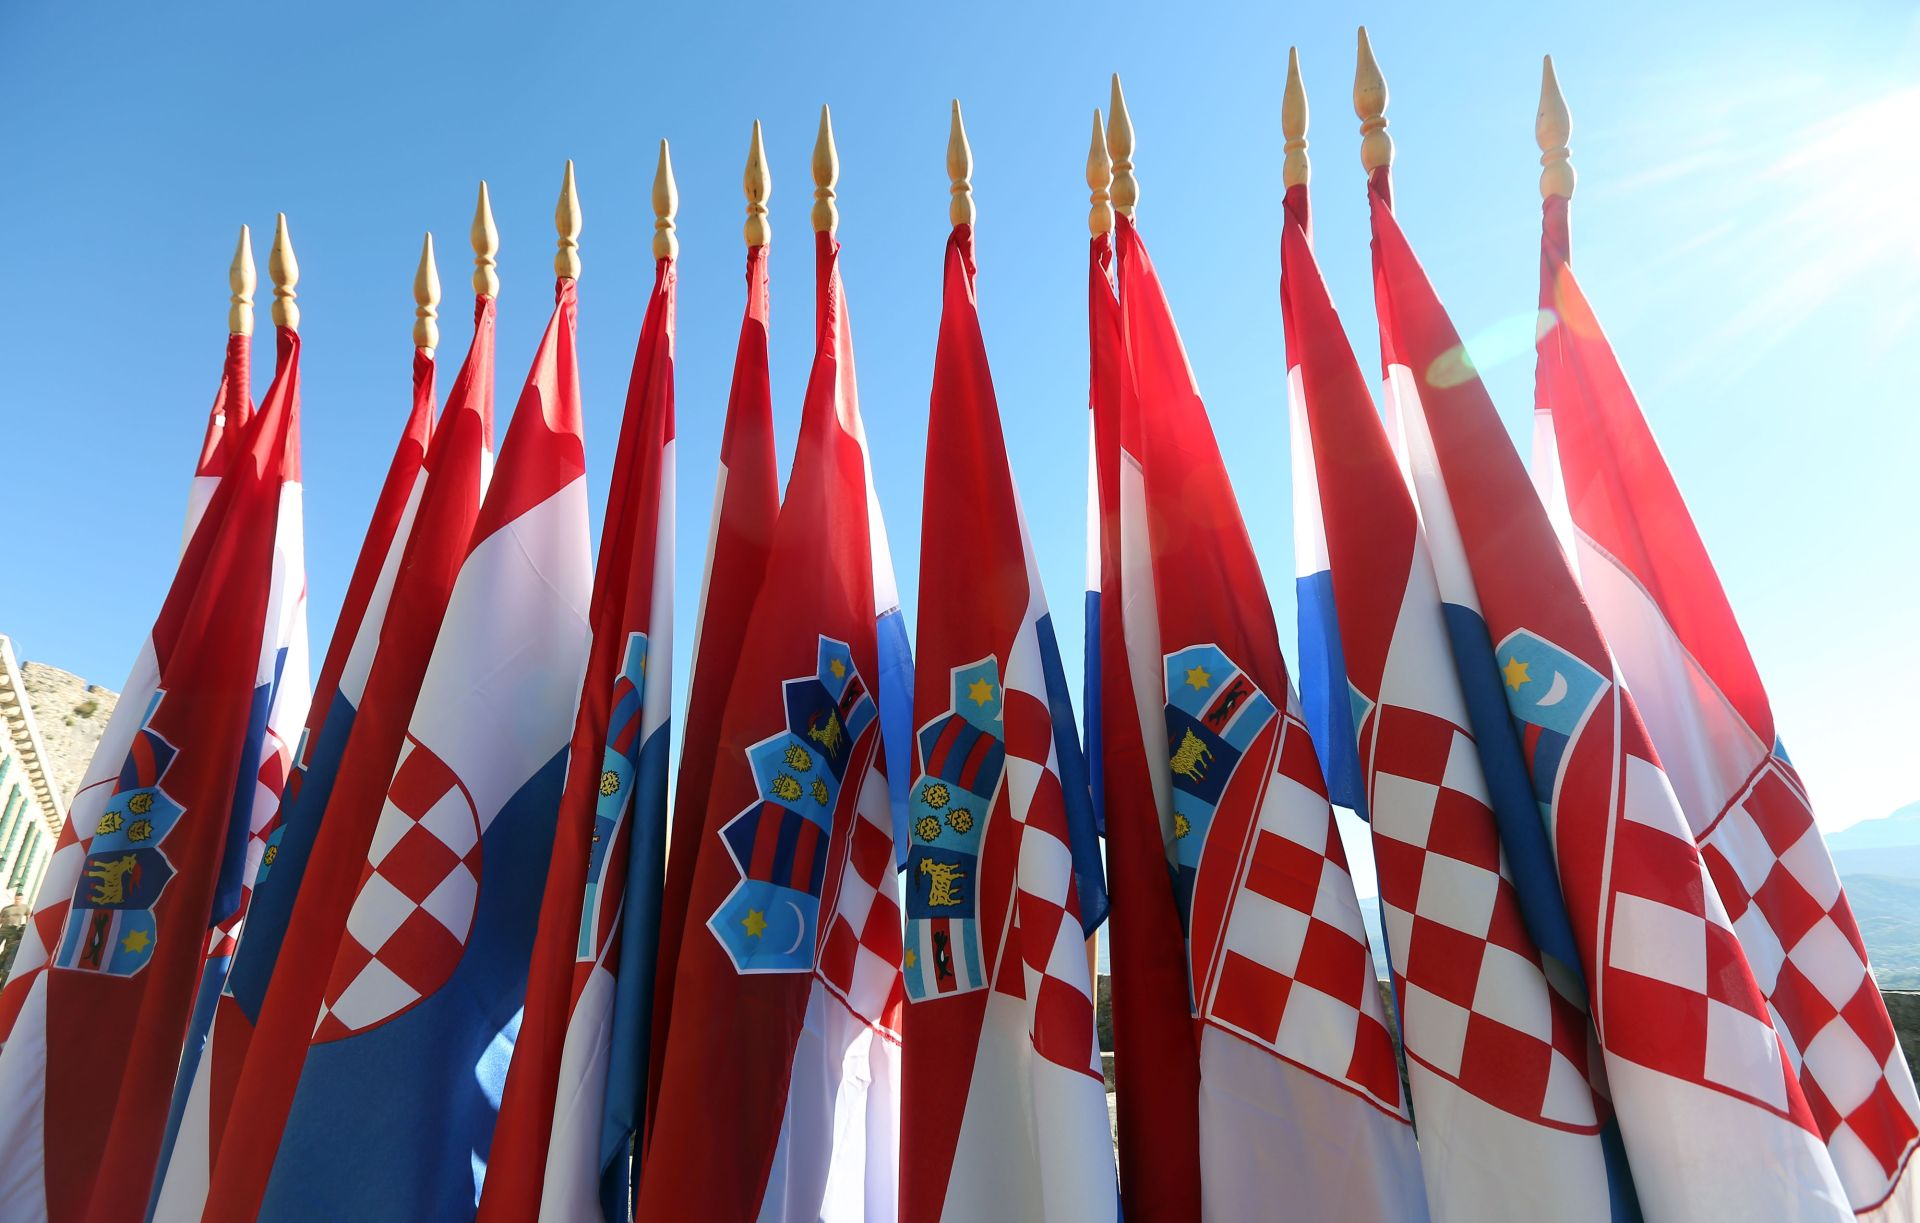 OBLJETNICA OLUJE Podignuta državna zastava na Kninskoj tvrđavi